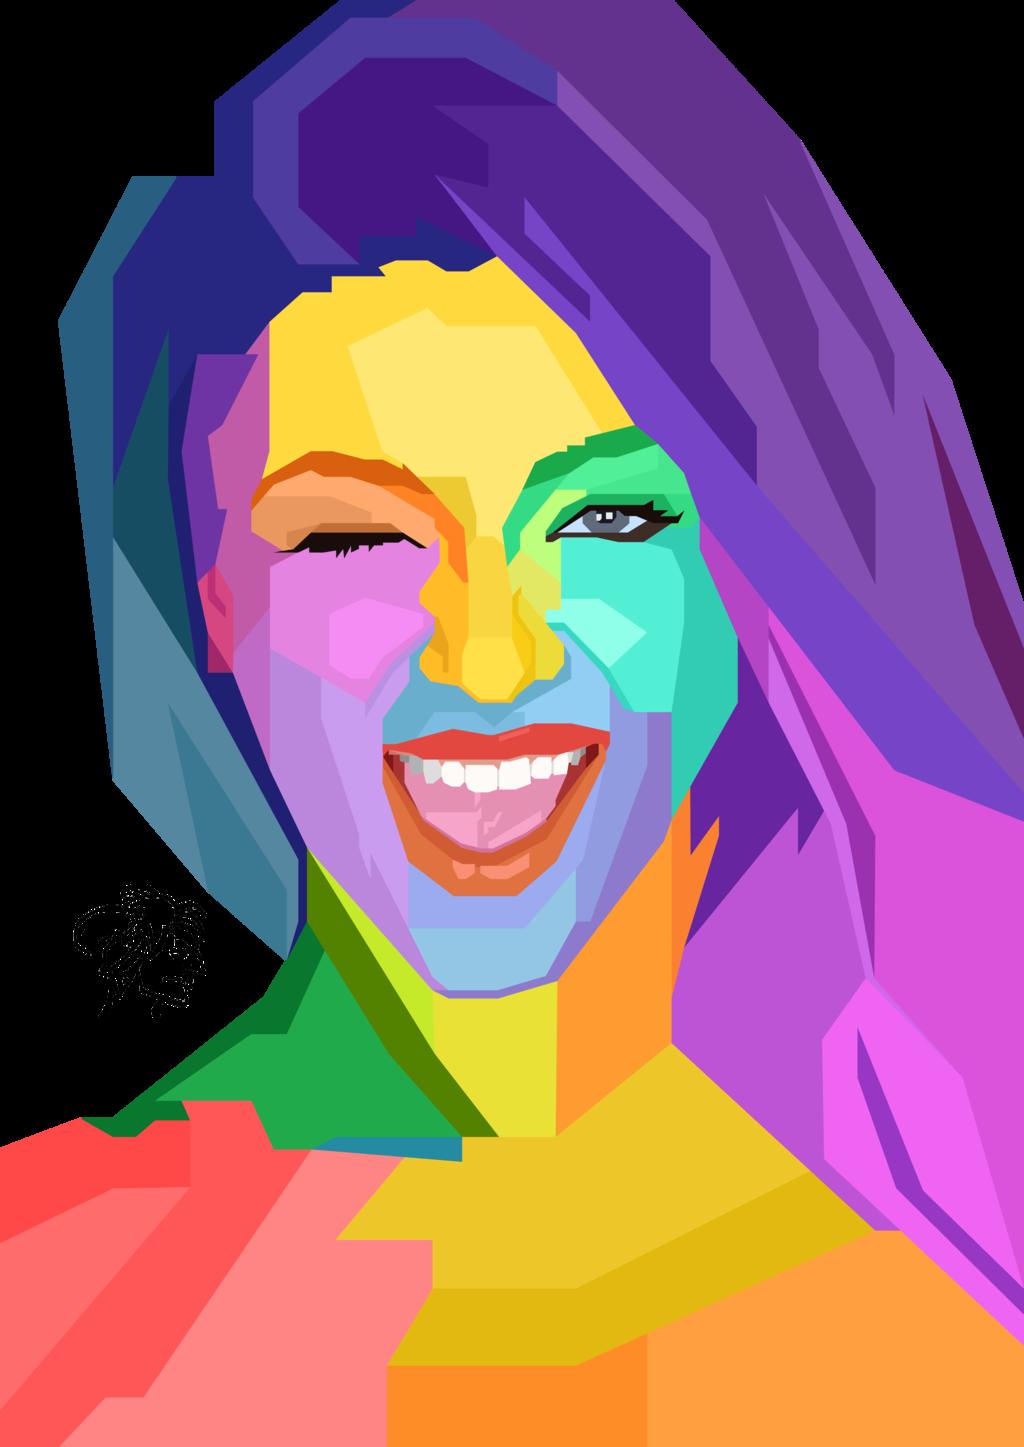 svg free library Hijab vector pop art. Blanca brooke portrait by